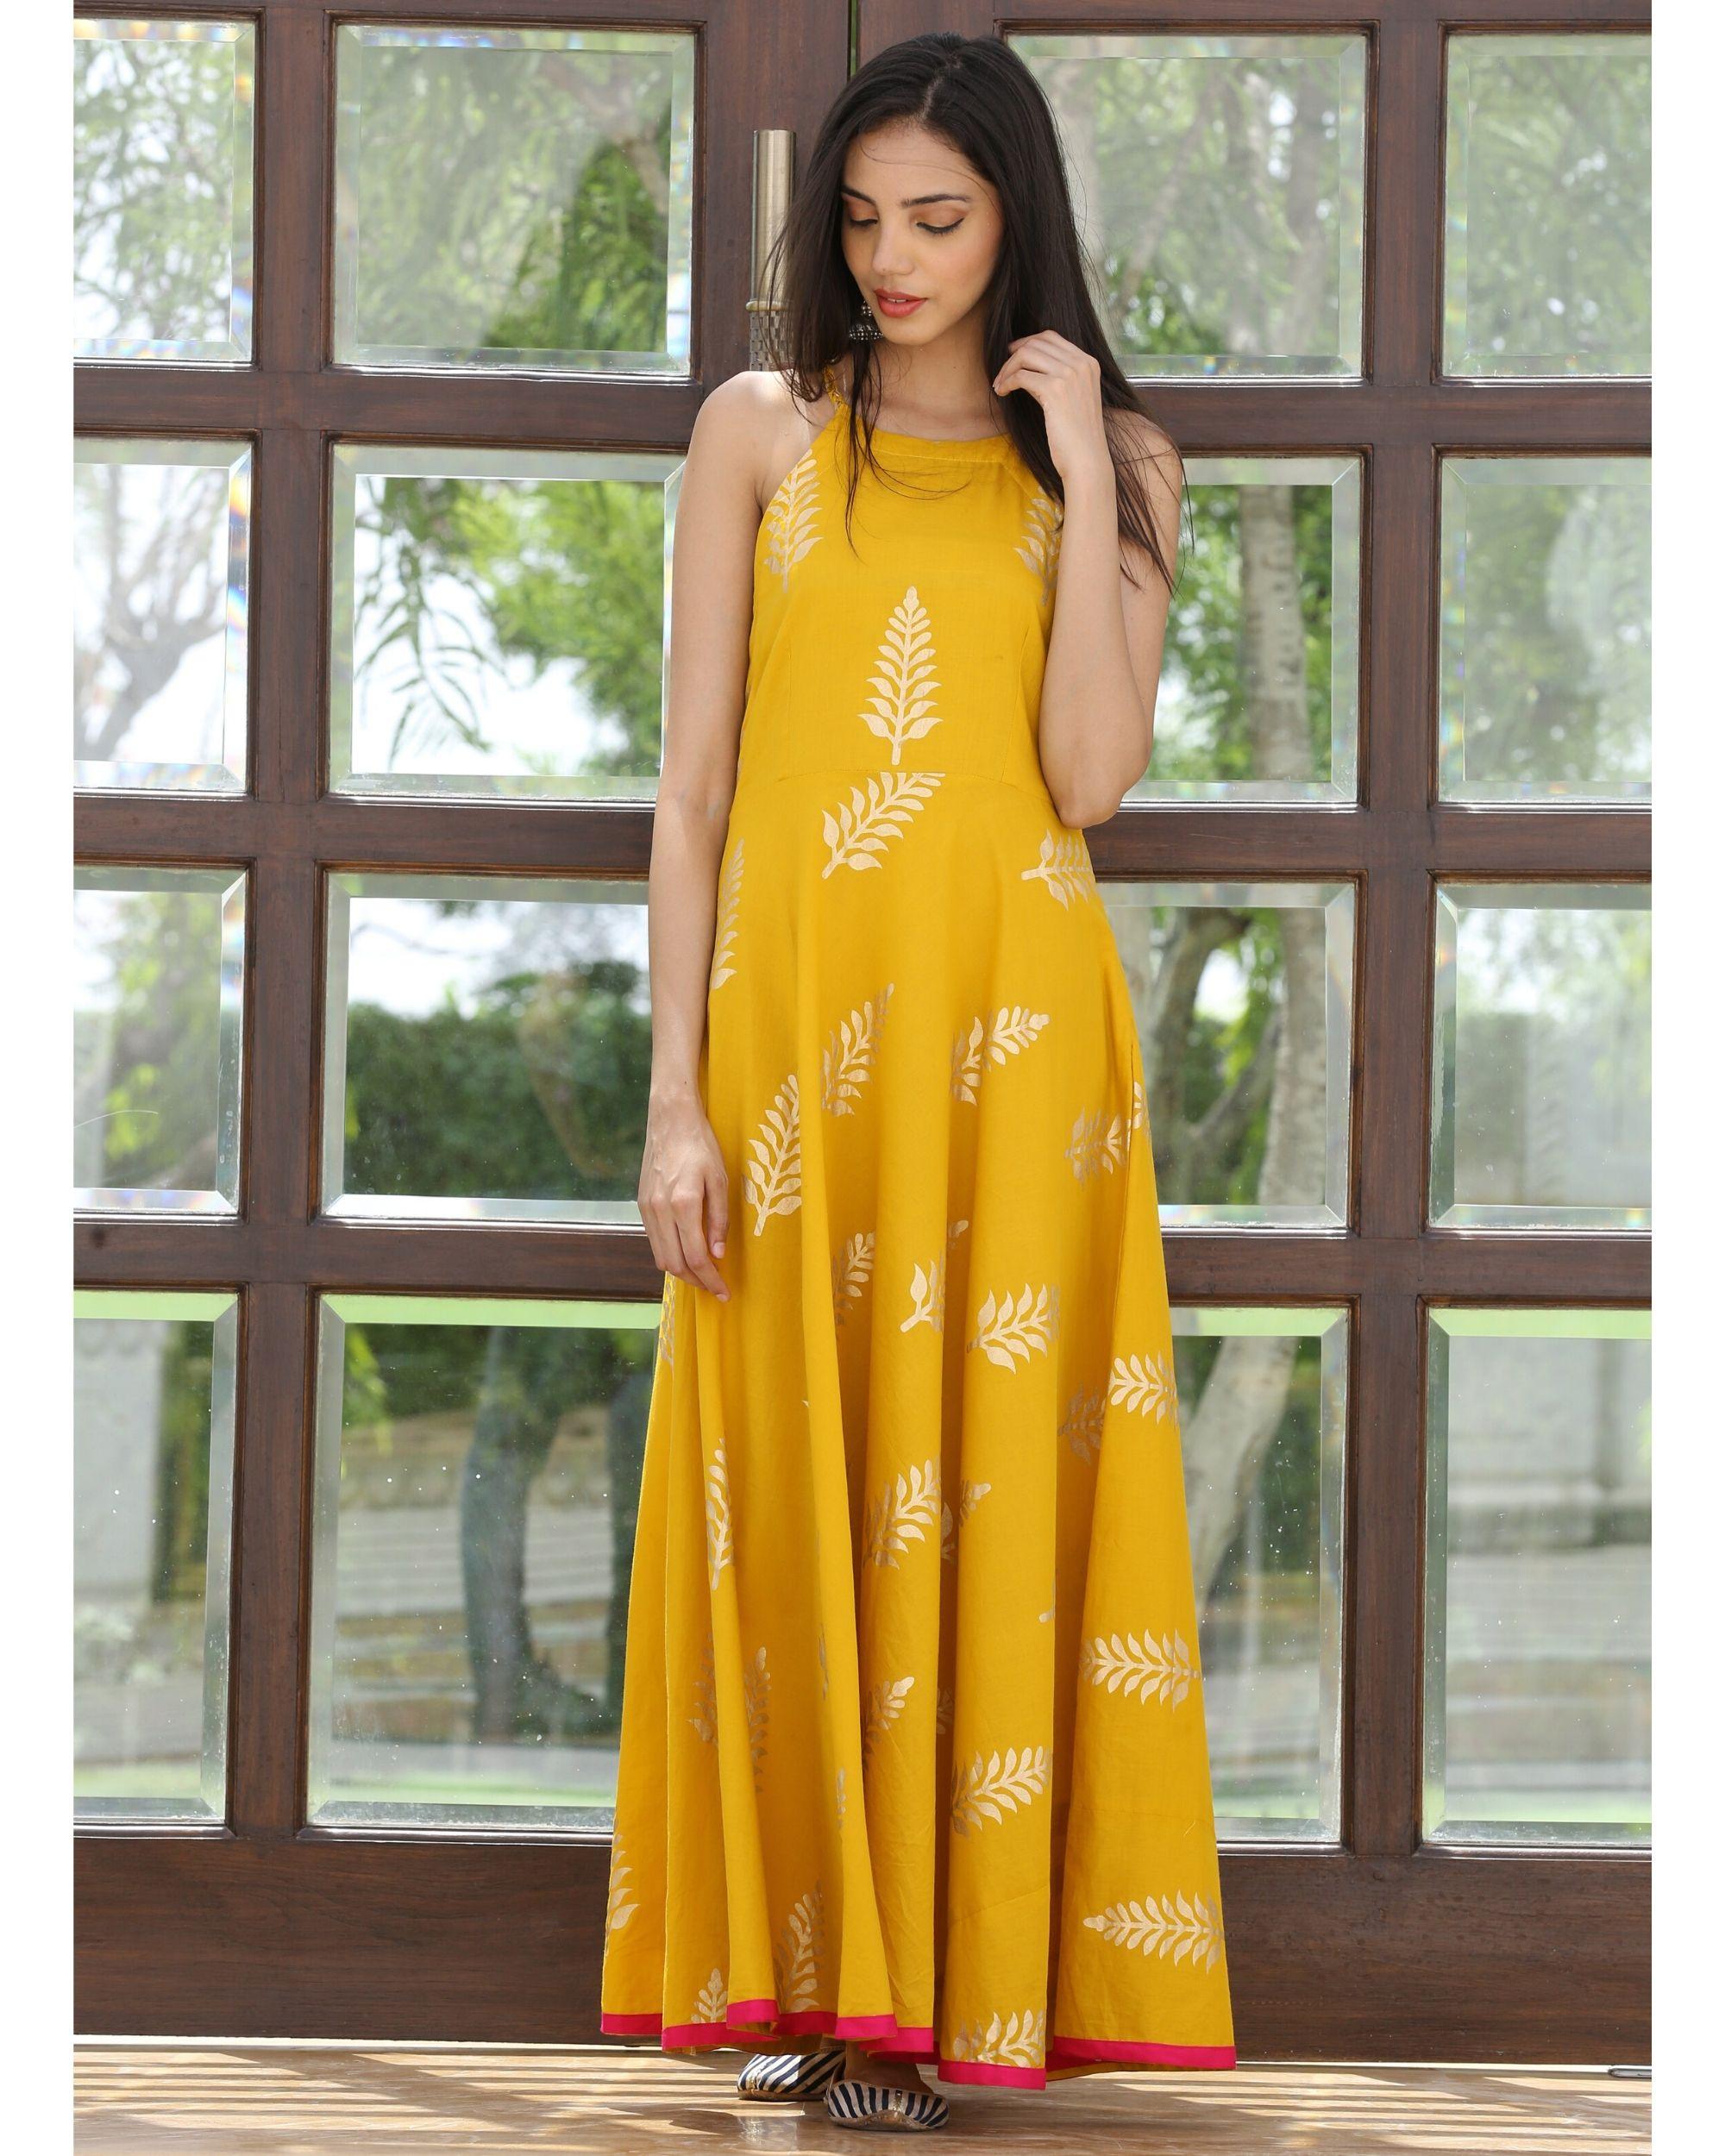 Mango yellow halter maxi dress